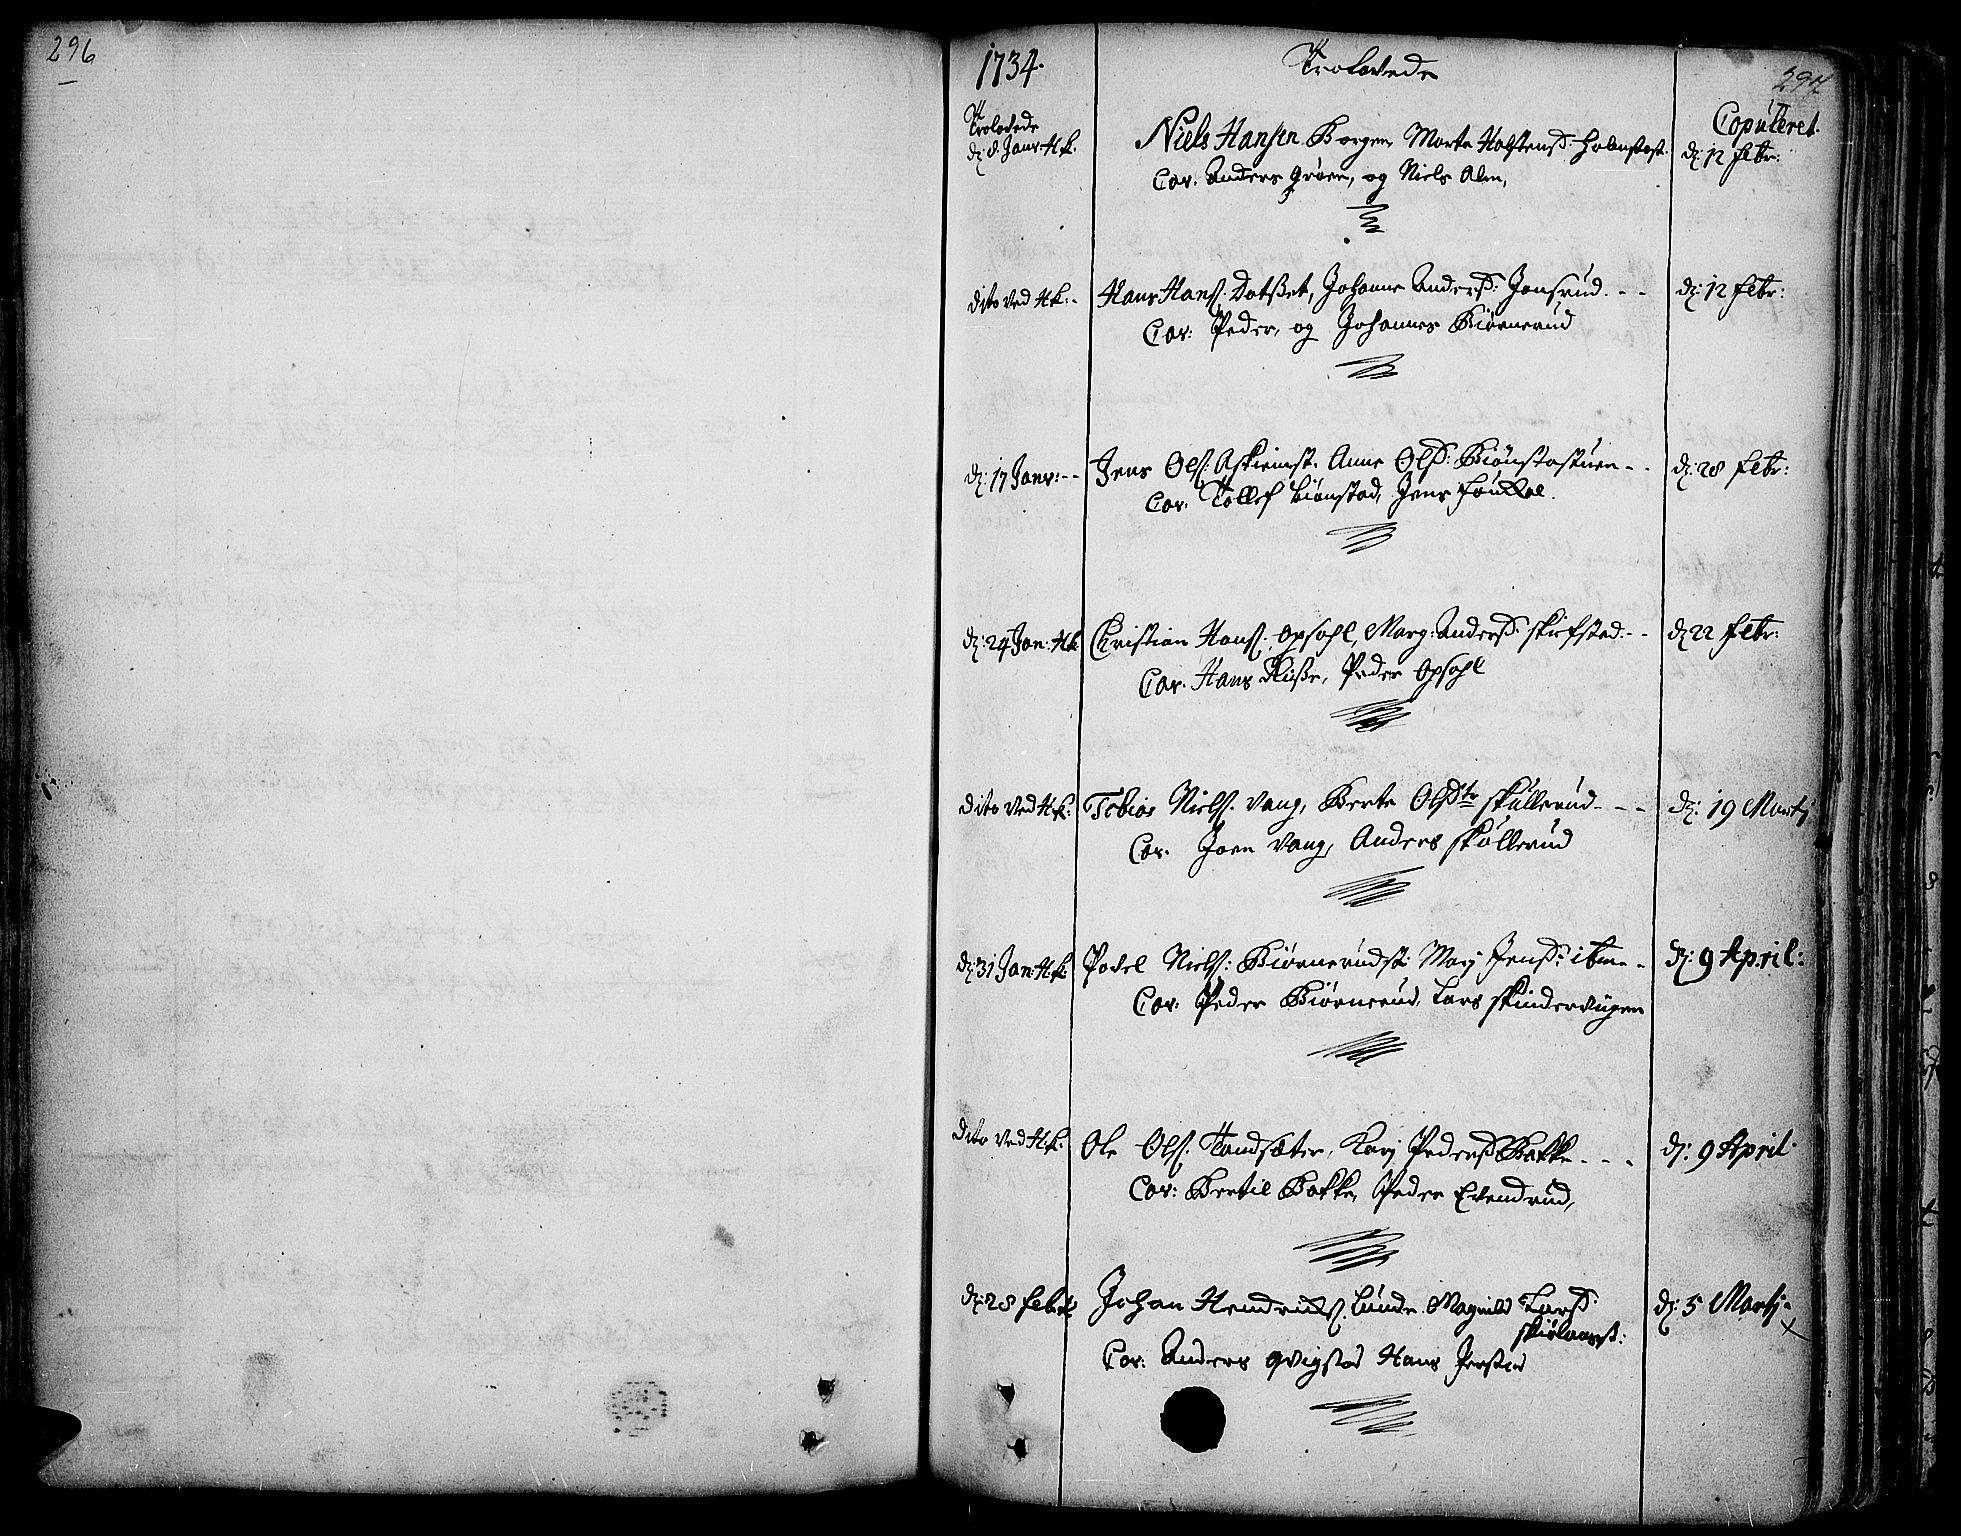 SAH, Toten prestekontor, Ministerialbok nr. 3, 1734-1751, s. 296-297